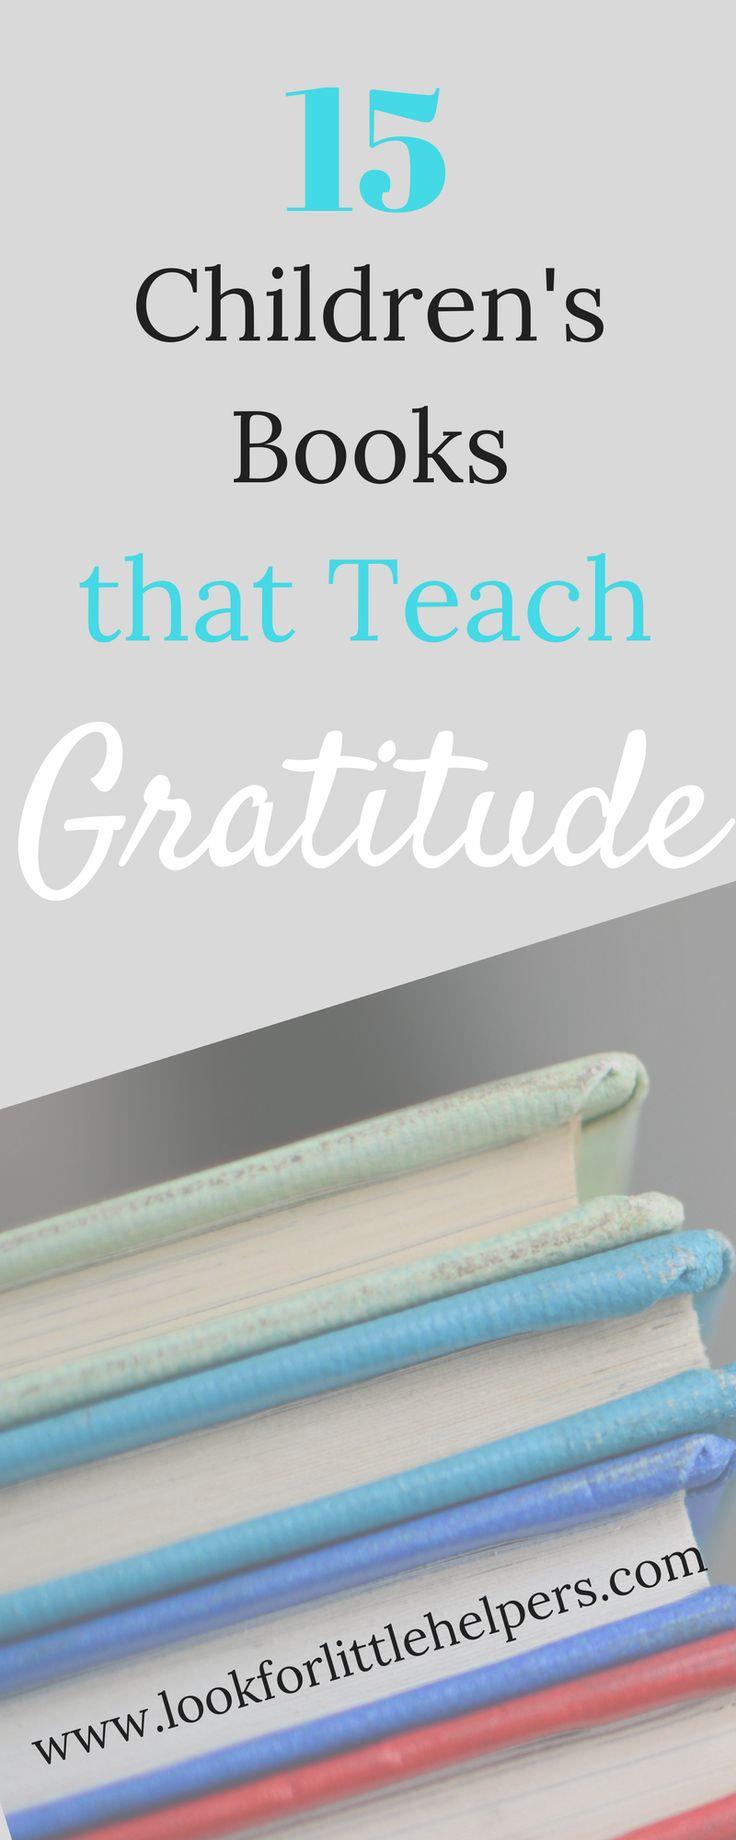 Children's books that teach #gratitude.  One way to teach kids to be grateful.